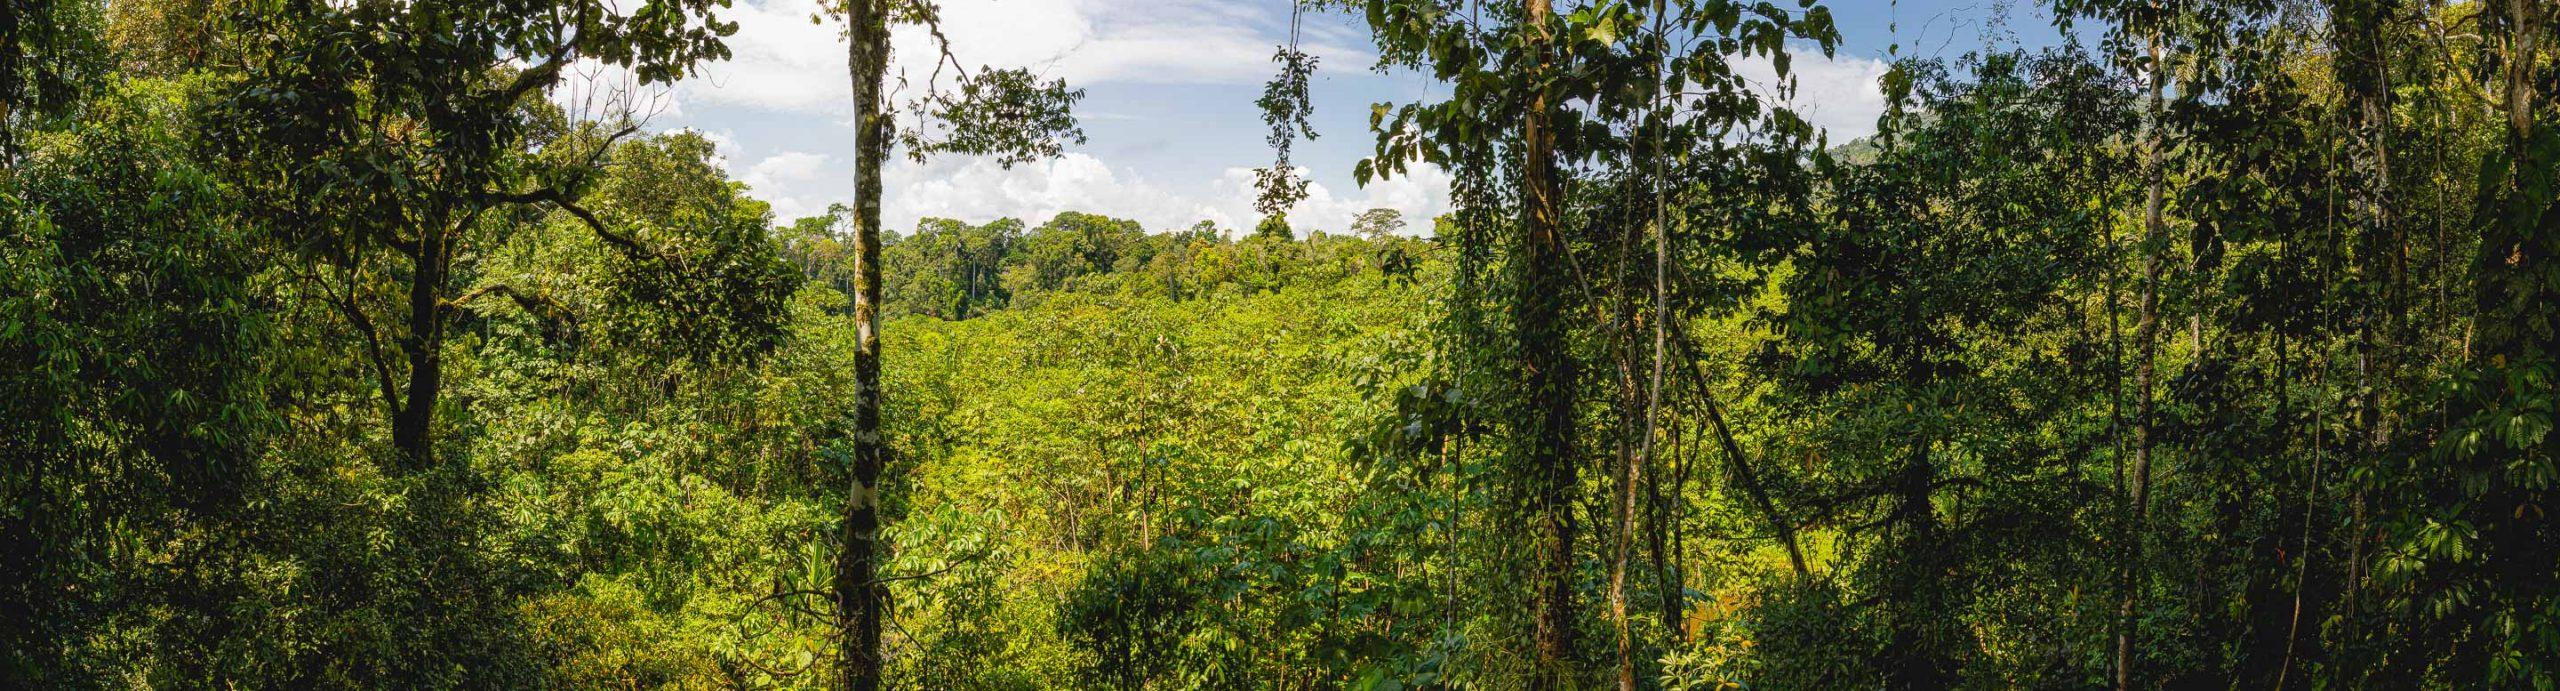 MIRADOR ATALAYA (WATCHTOWER LOOKOUT) – THE AMAZON BASIN